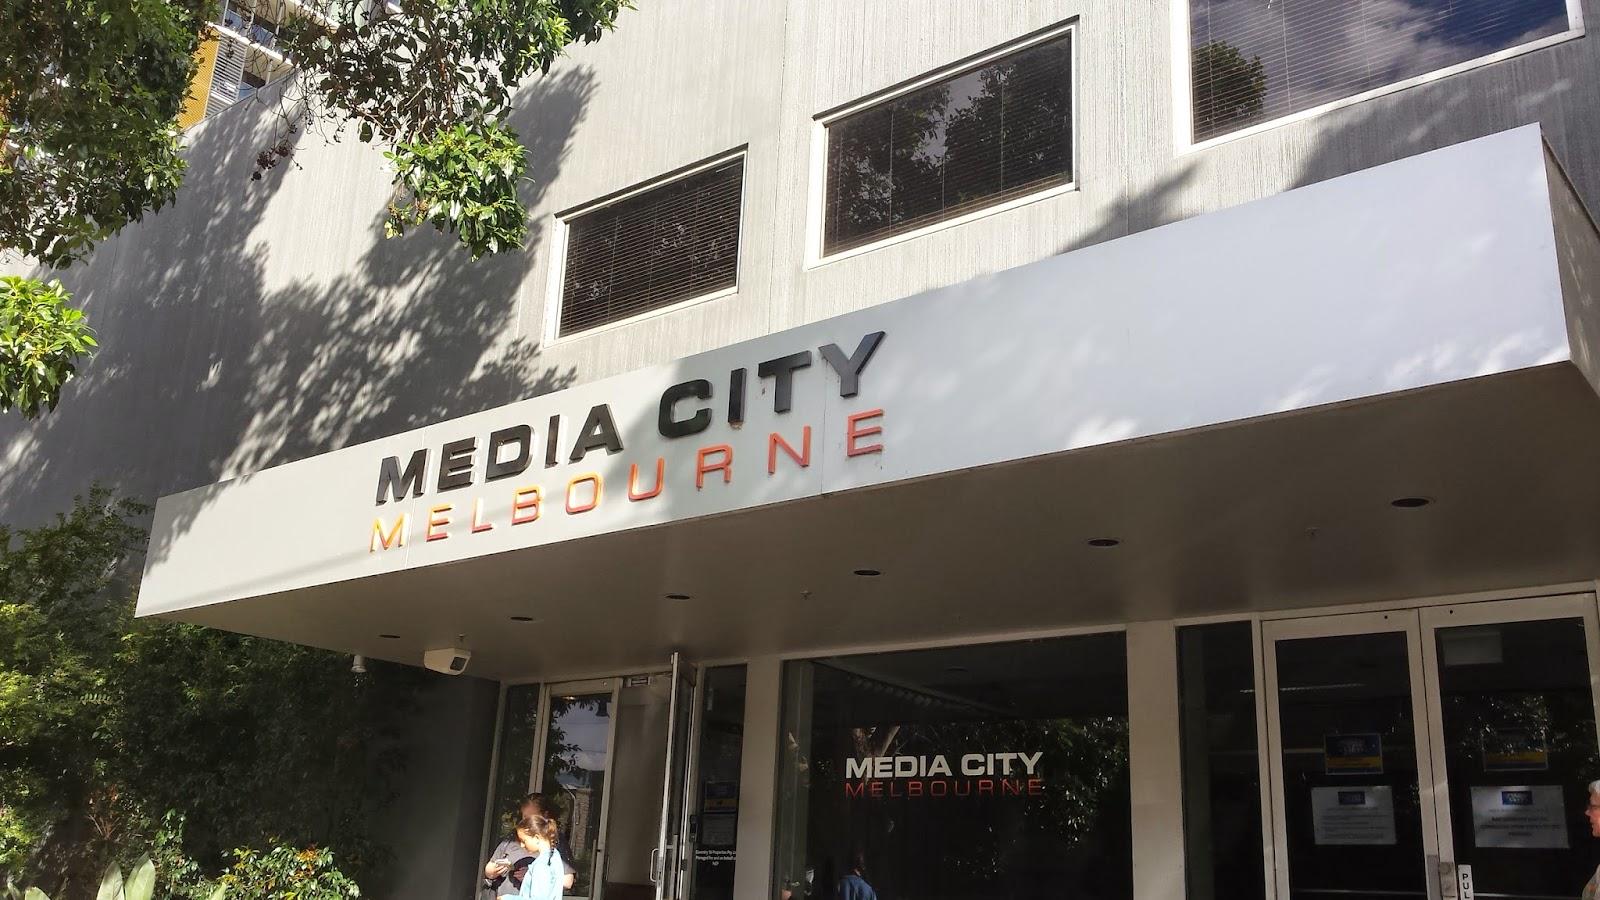 Media City, Melbourne